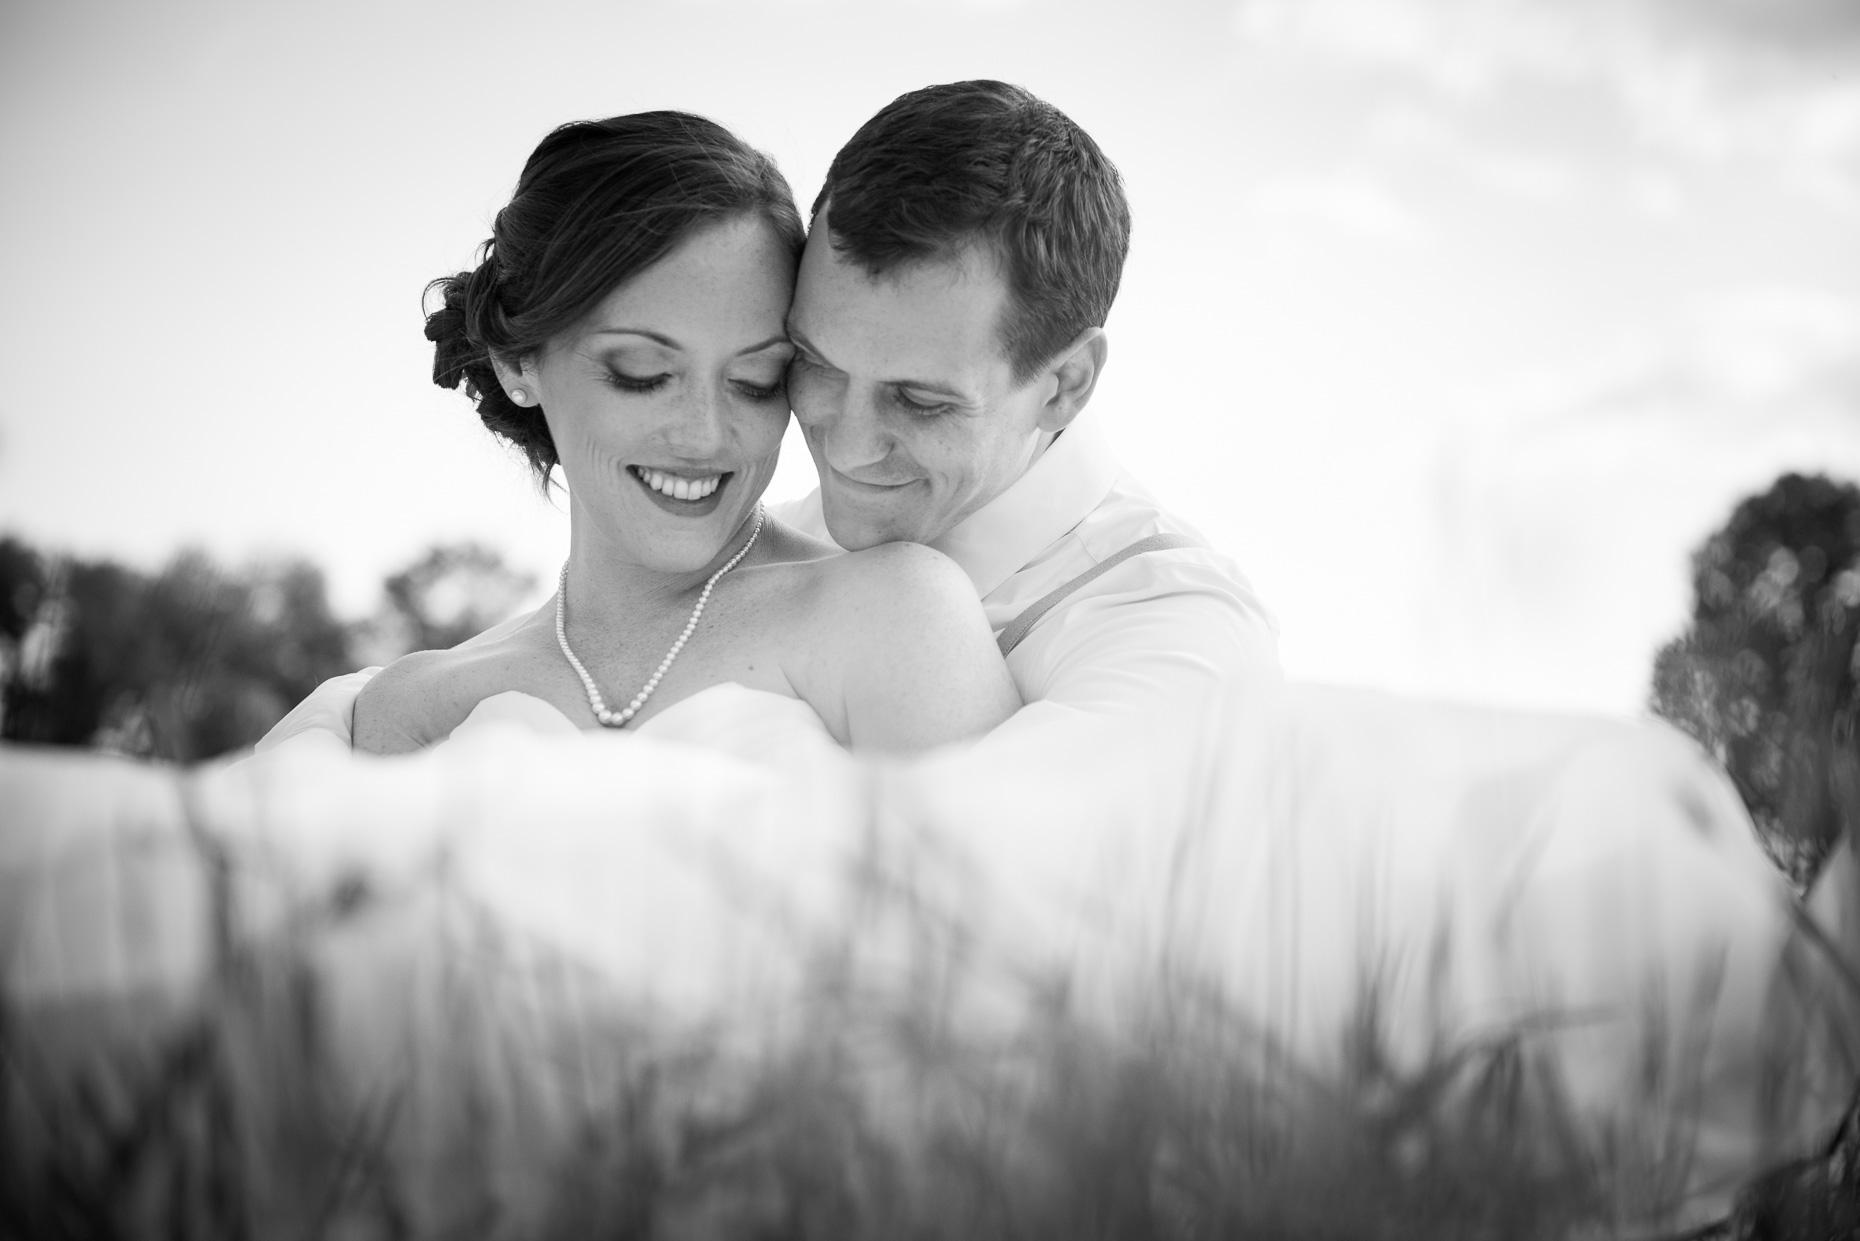 Weddings by Elliott O'Donovan - Washington DC_-18.jpg